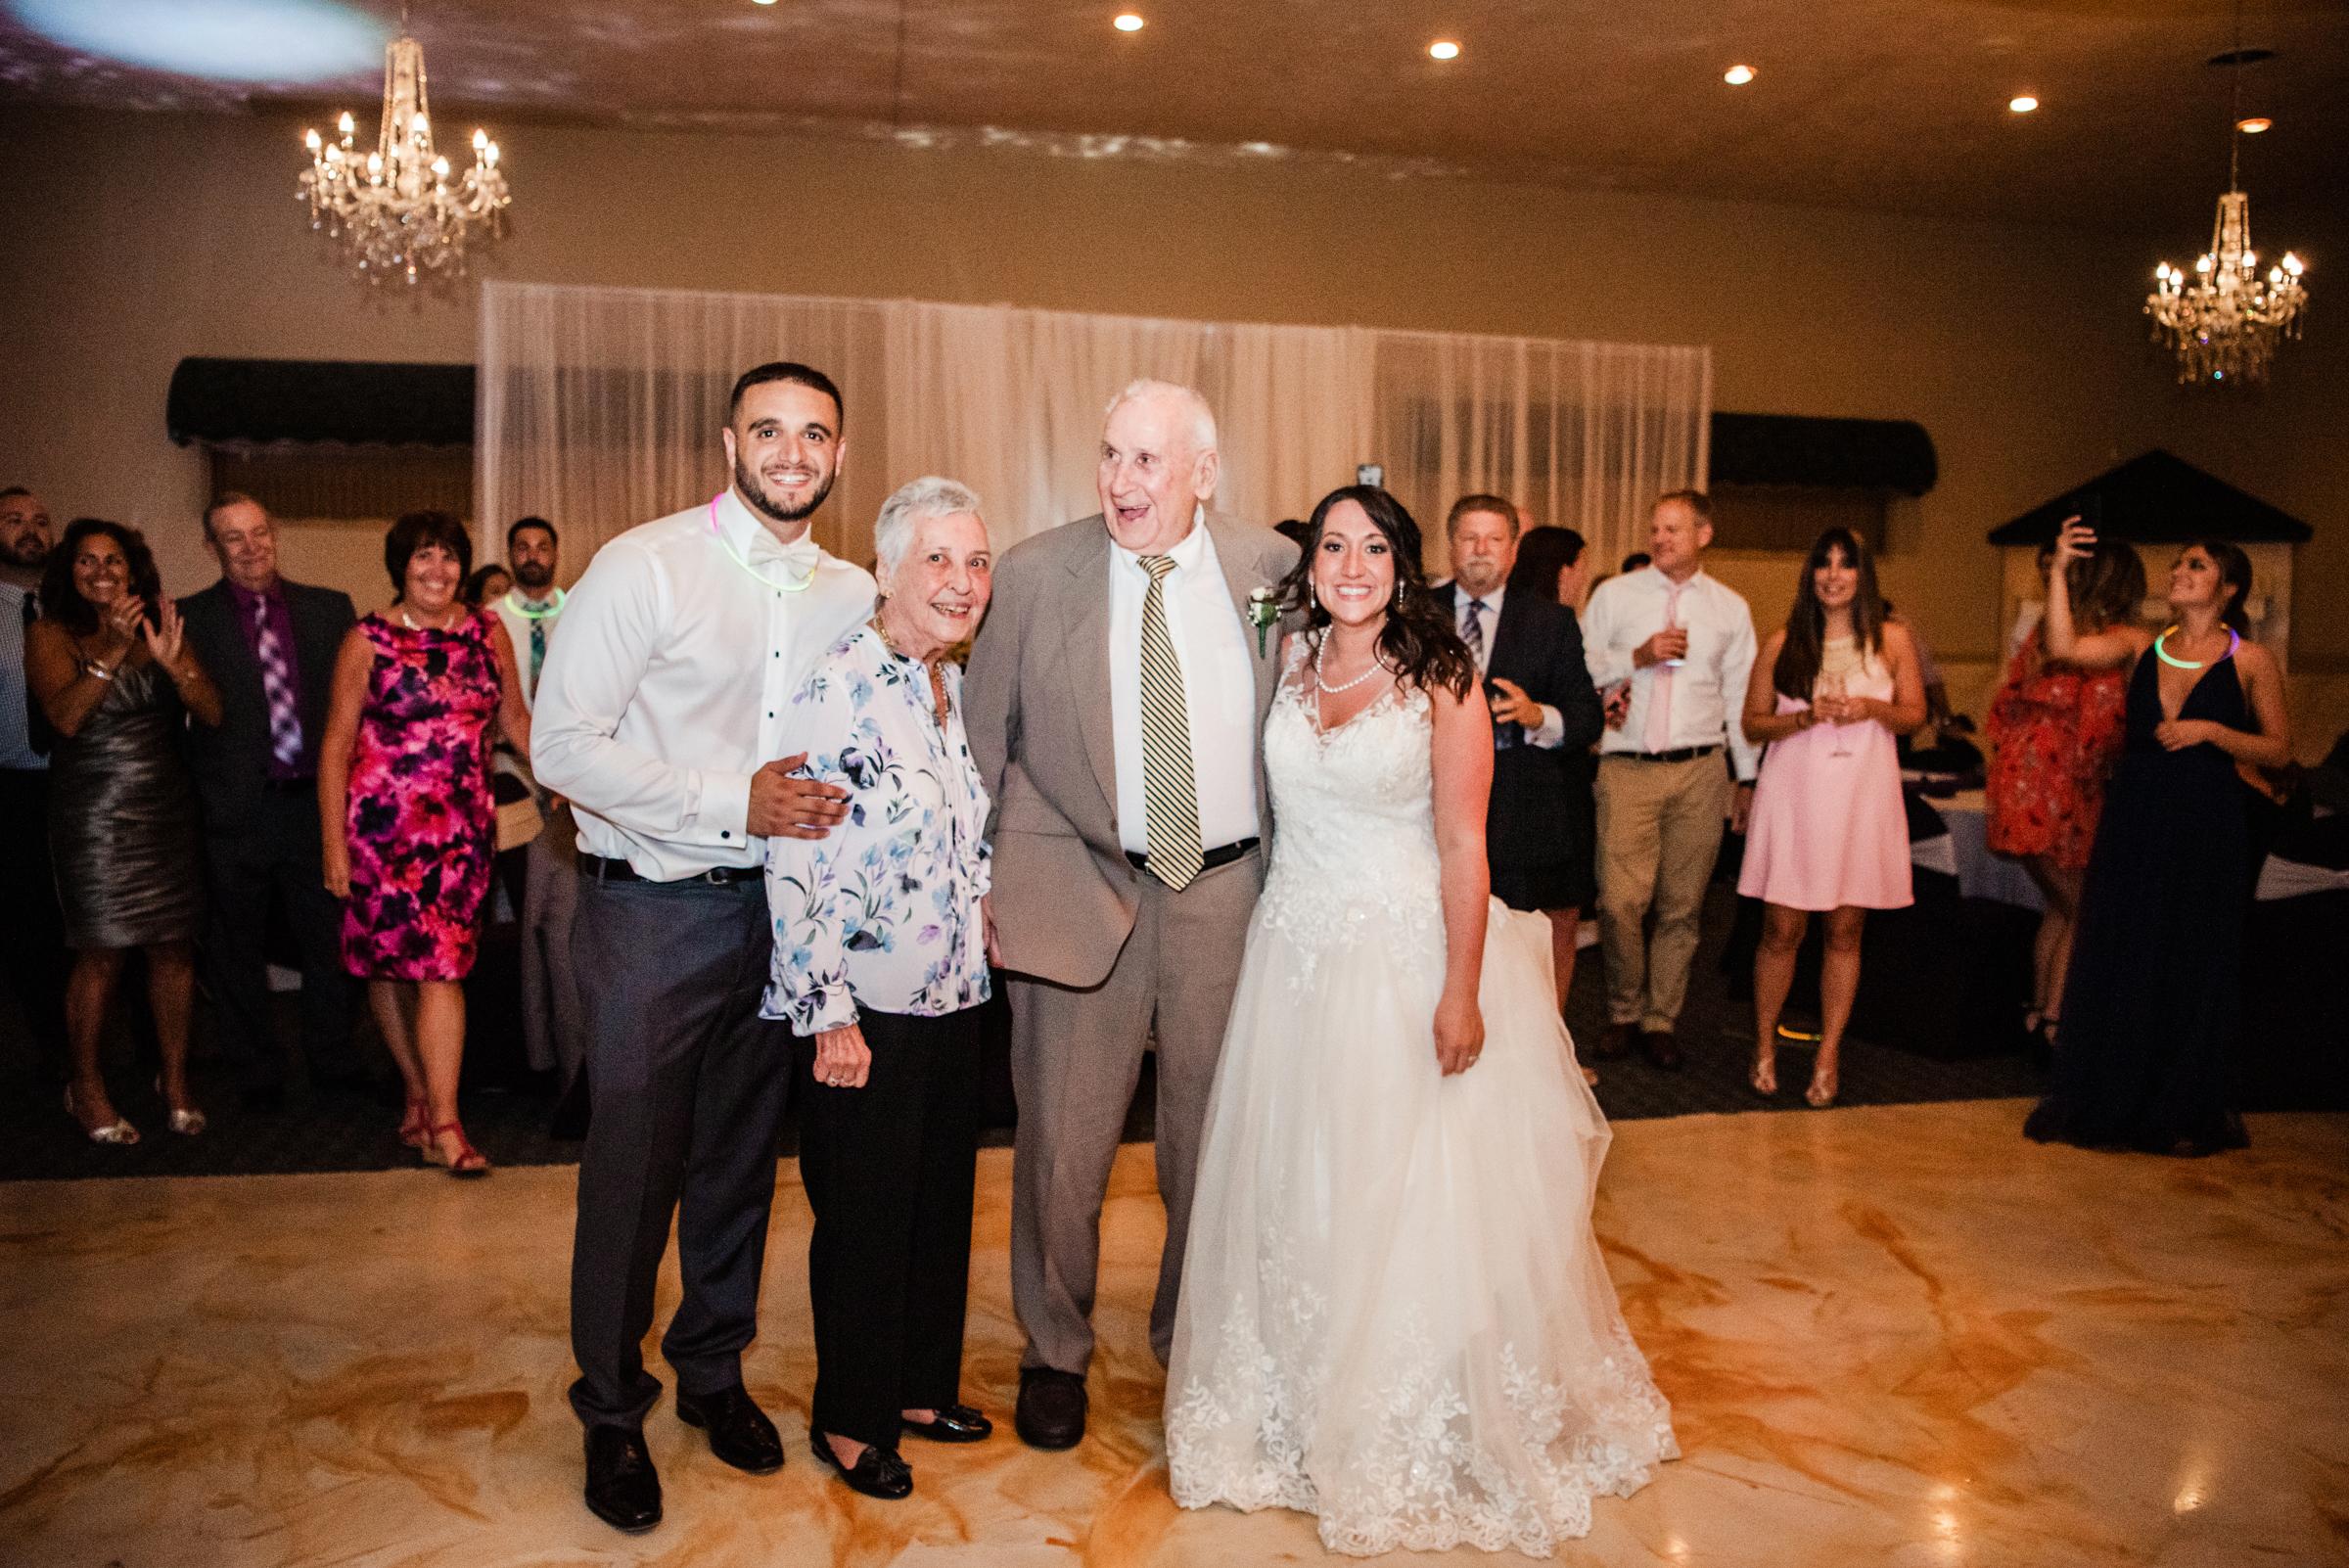 Historic_Old_St_Johns_Church_Valentinos_Banquet_Hall_Central_NY_Wedding_JILL_STUDIO_Rochester_NY_Photographer_DSC_7152.jpg